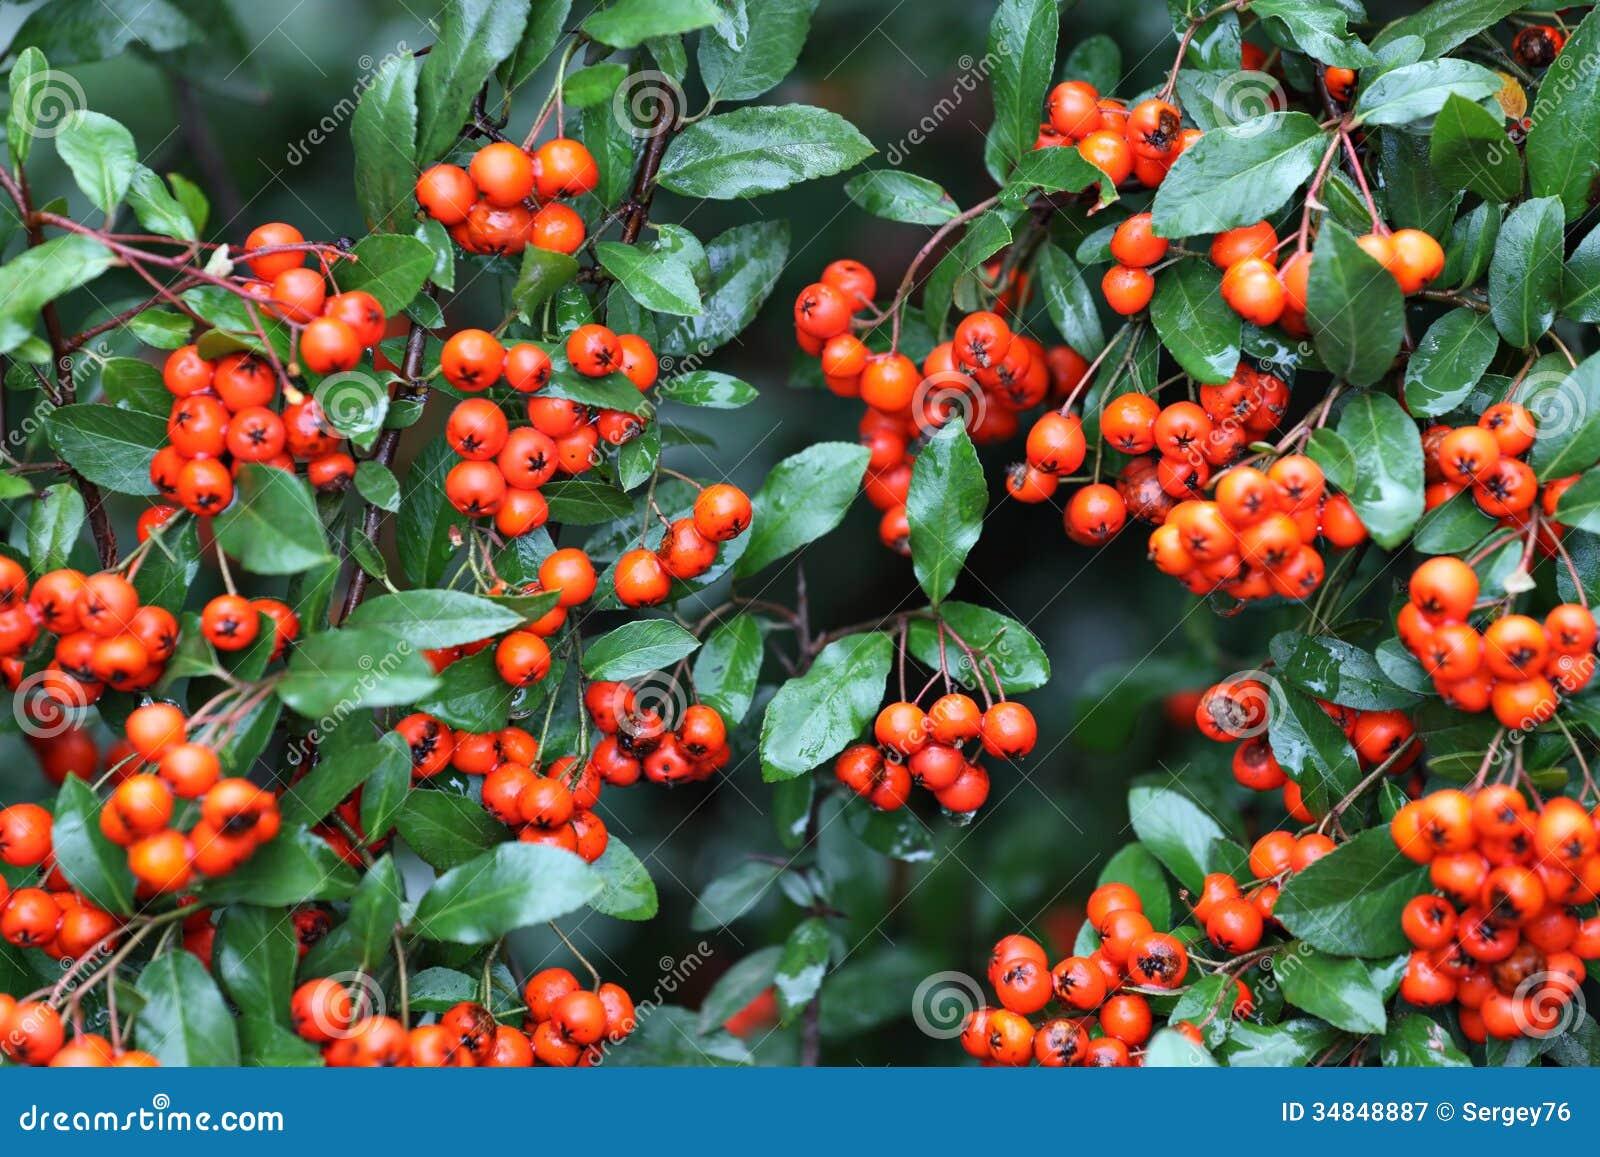 Bacche rosse del pyracantha con le foglie bagnate for Bacche rosse nomi